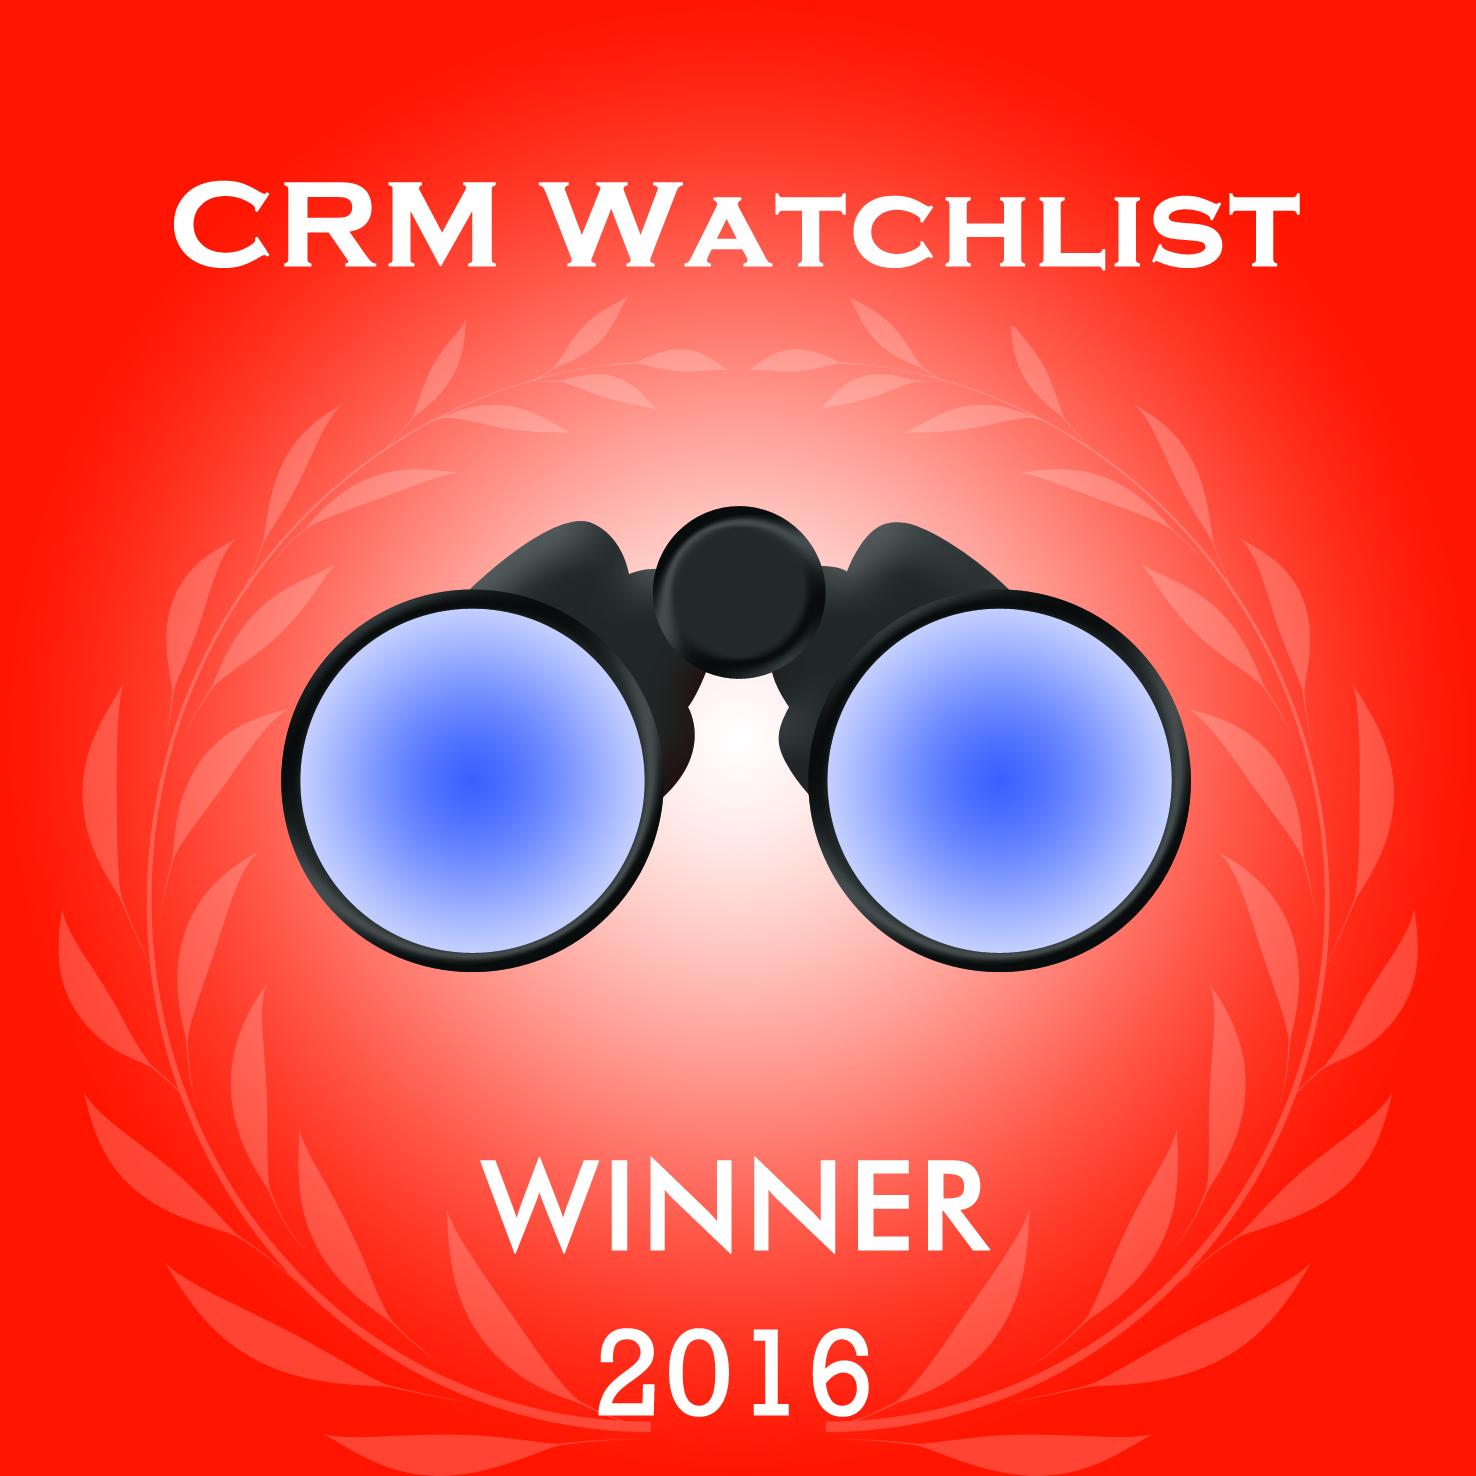 HubSpot Named Winner of 2016 CRM Watchlist